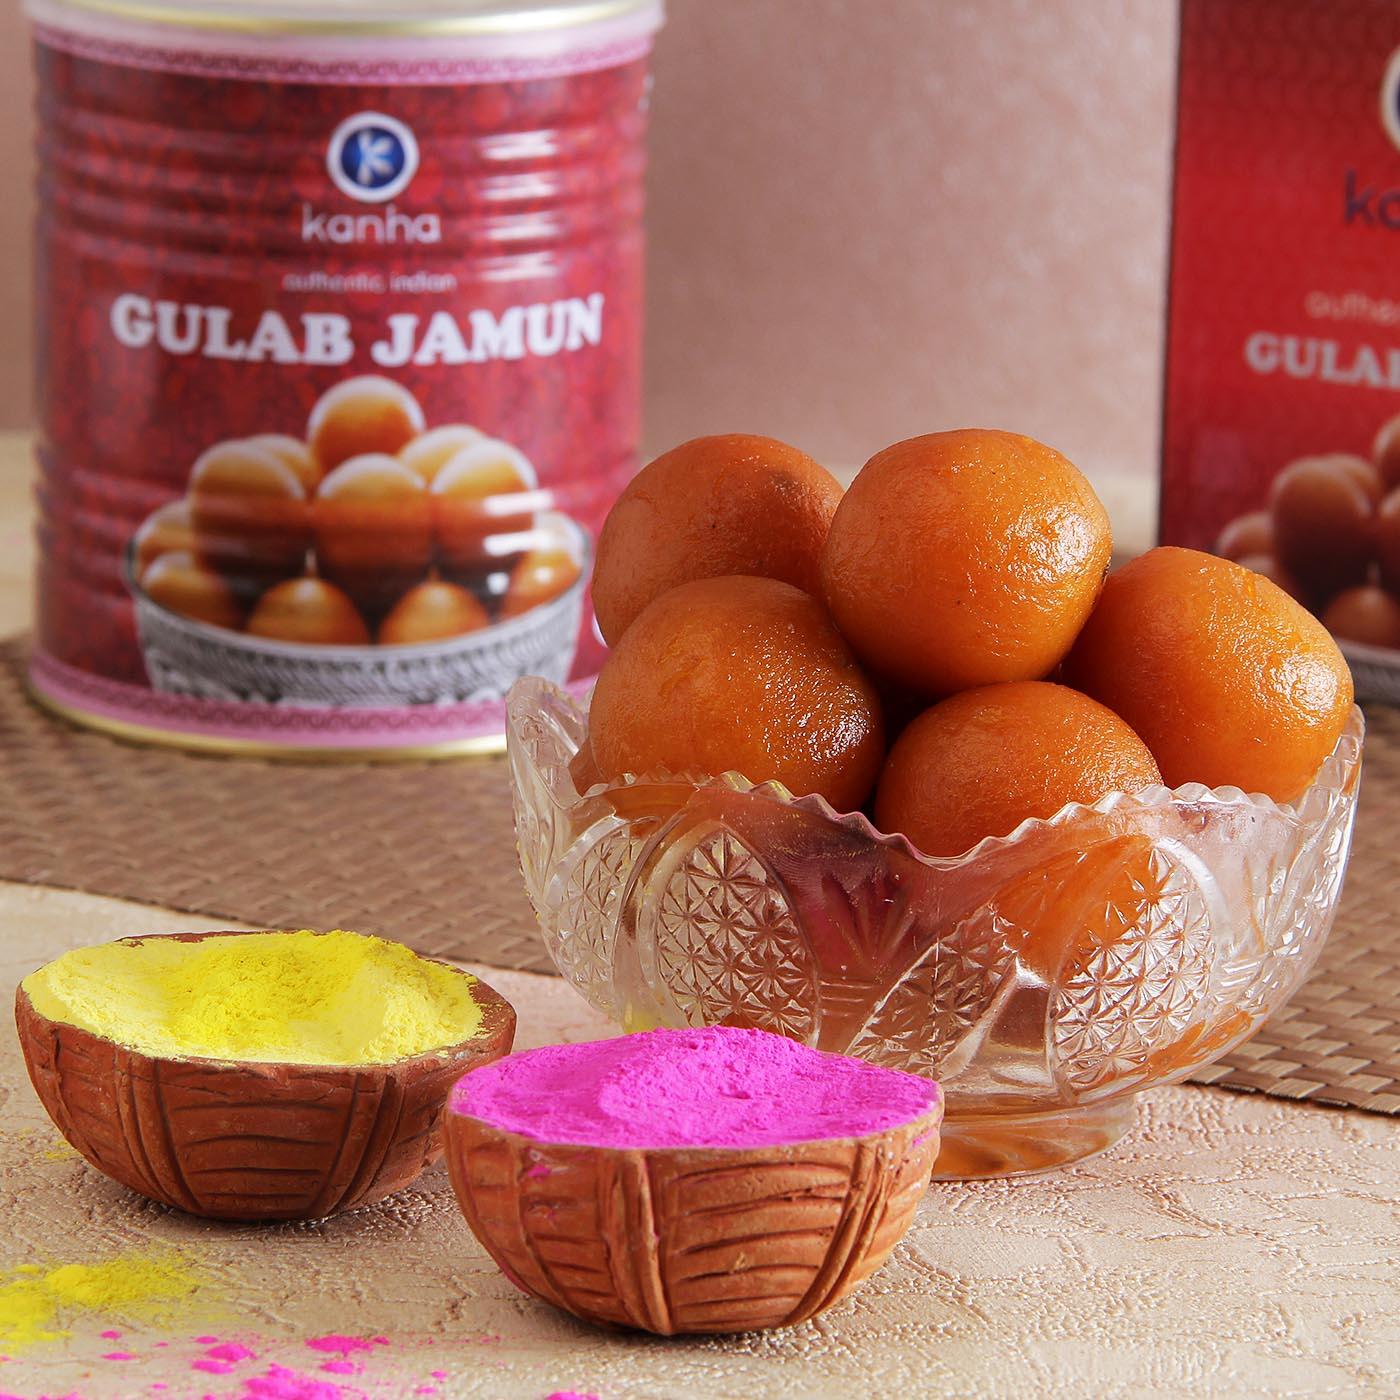 Gulab Jamun with Holi Color